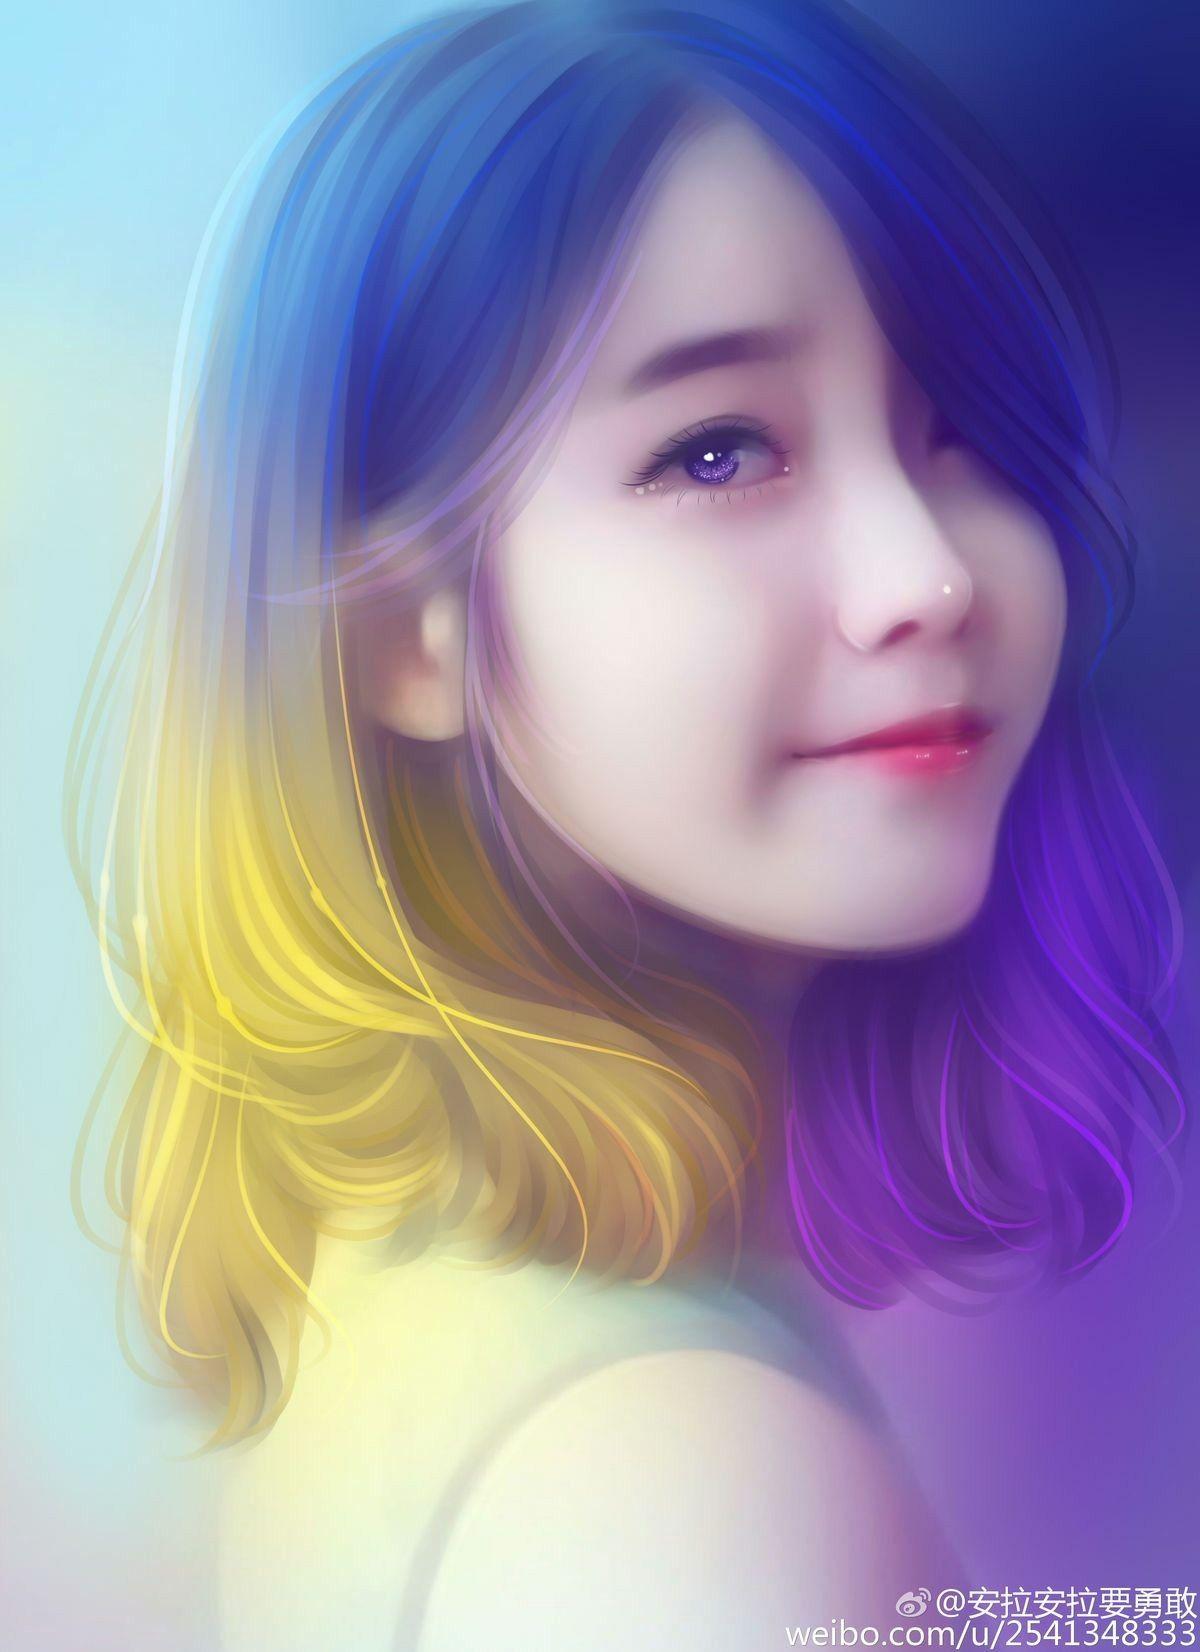 Pin by ovosailingsouls on Drawings Digital art girl, Art